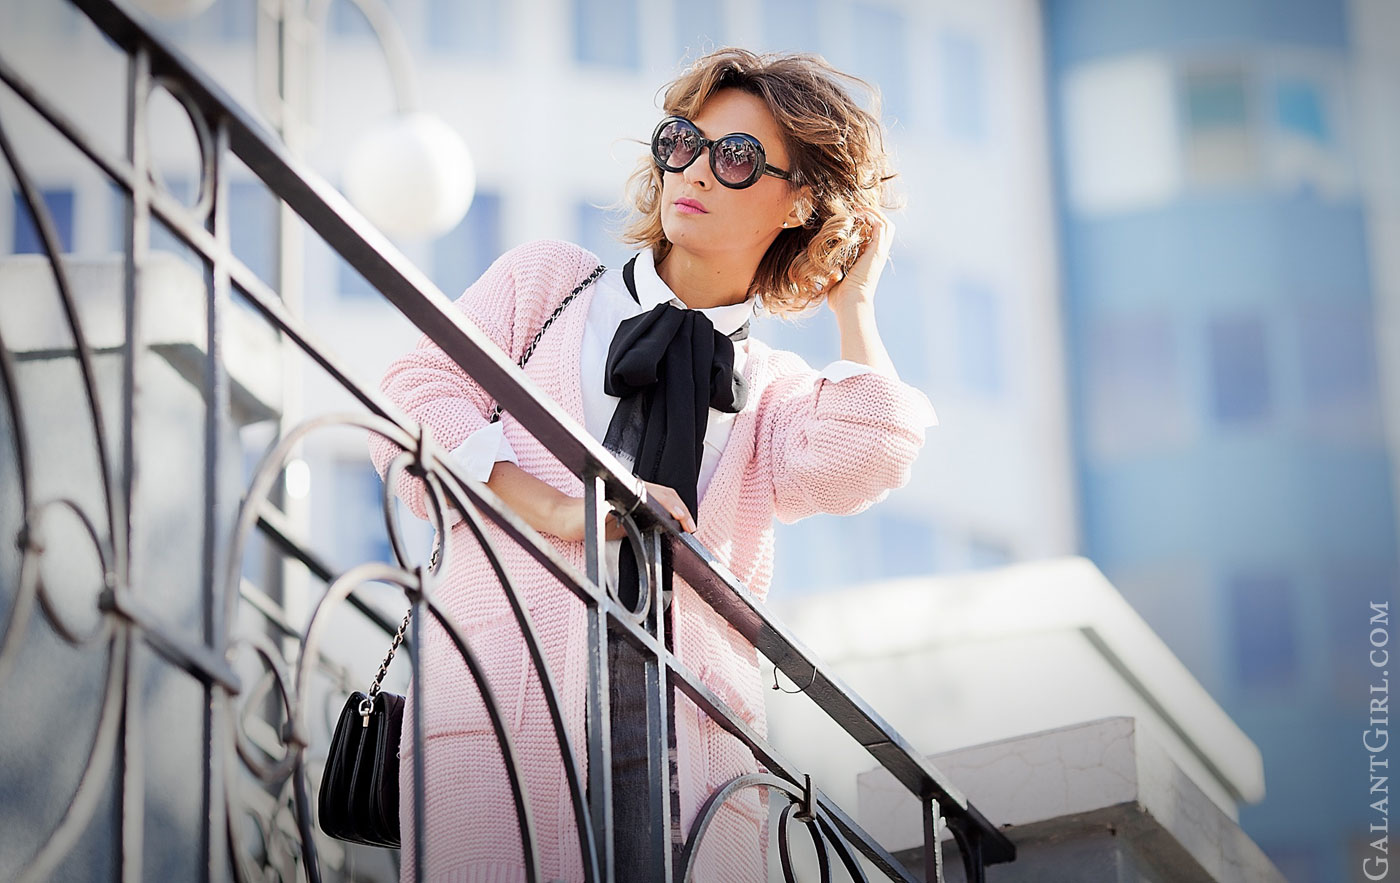 fashion+blogger+ellena+galant